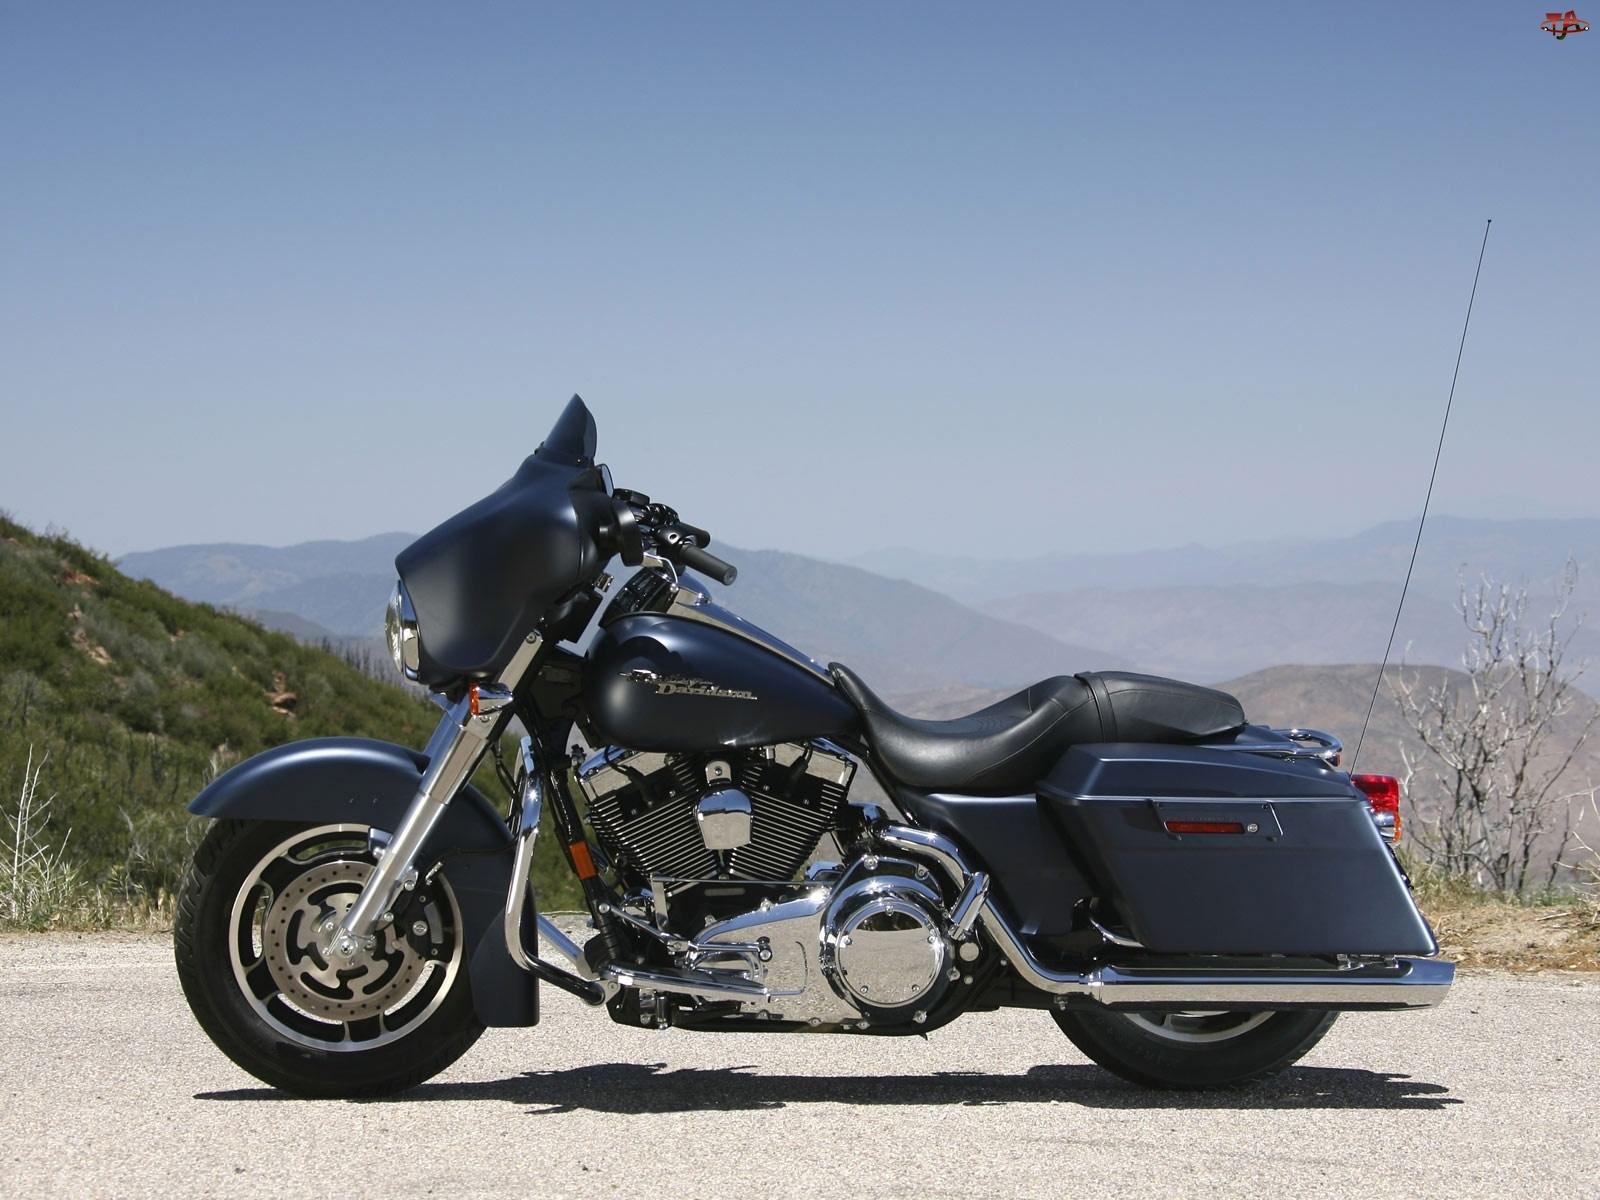 Chromowane, Harley-Davidson Touring Street Glide, Elementy